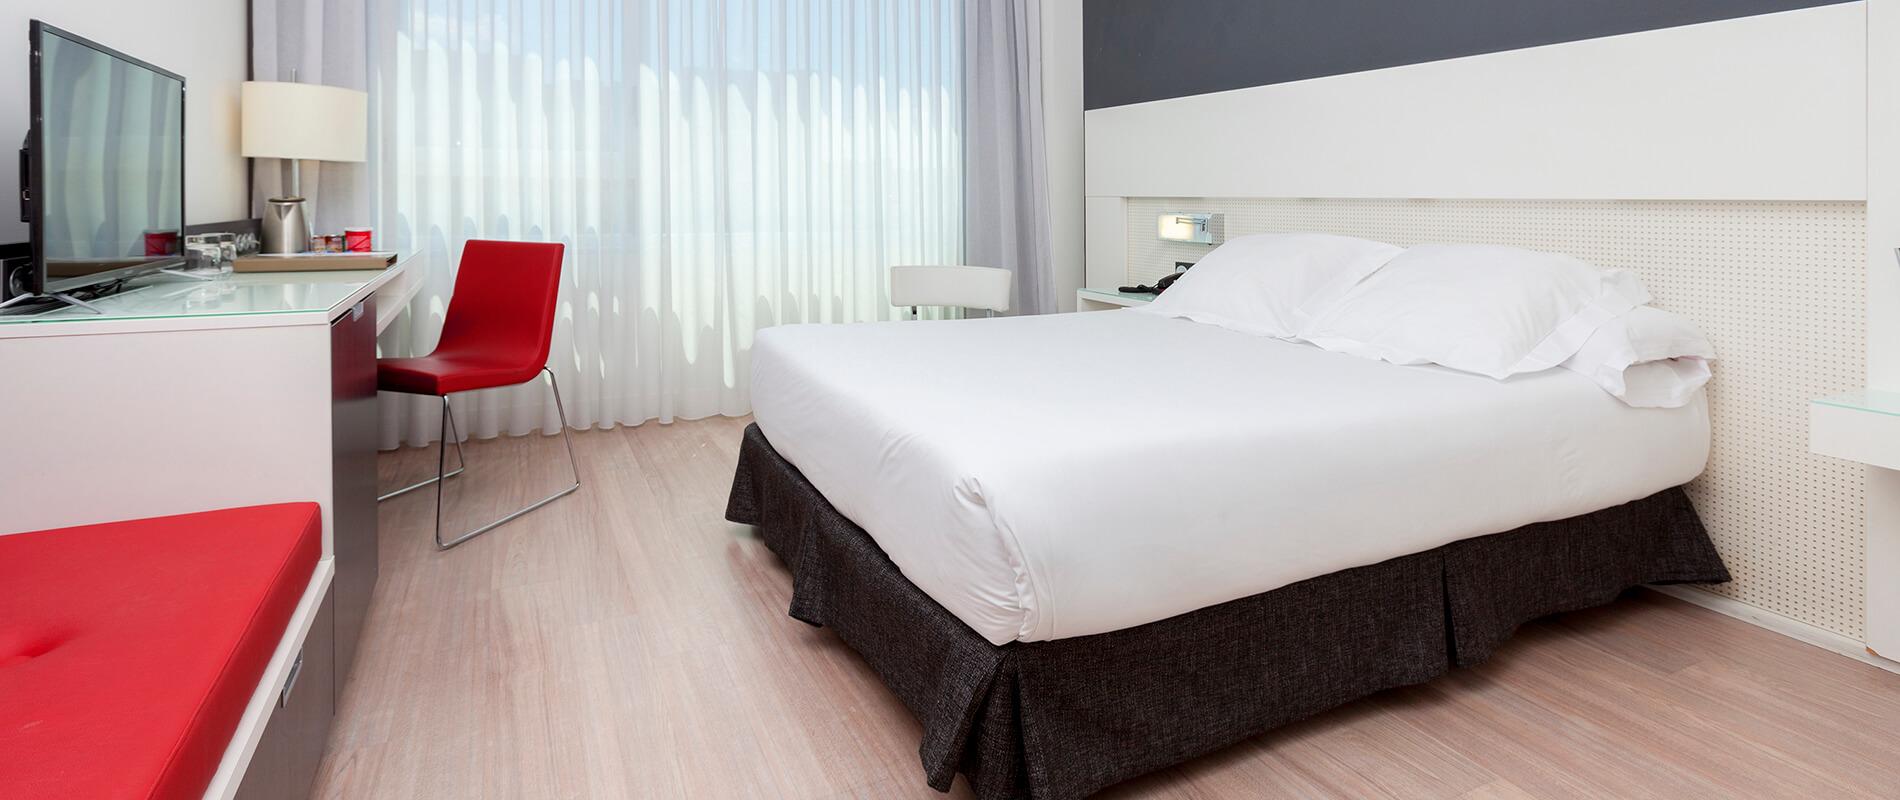 Hotel Axor Feria Madrid Ifema Official Website